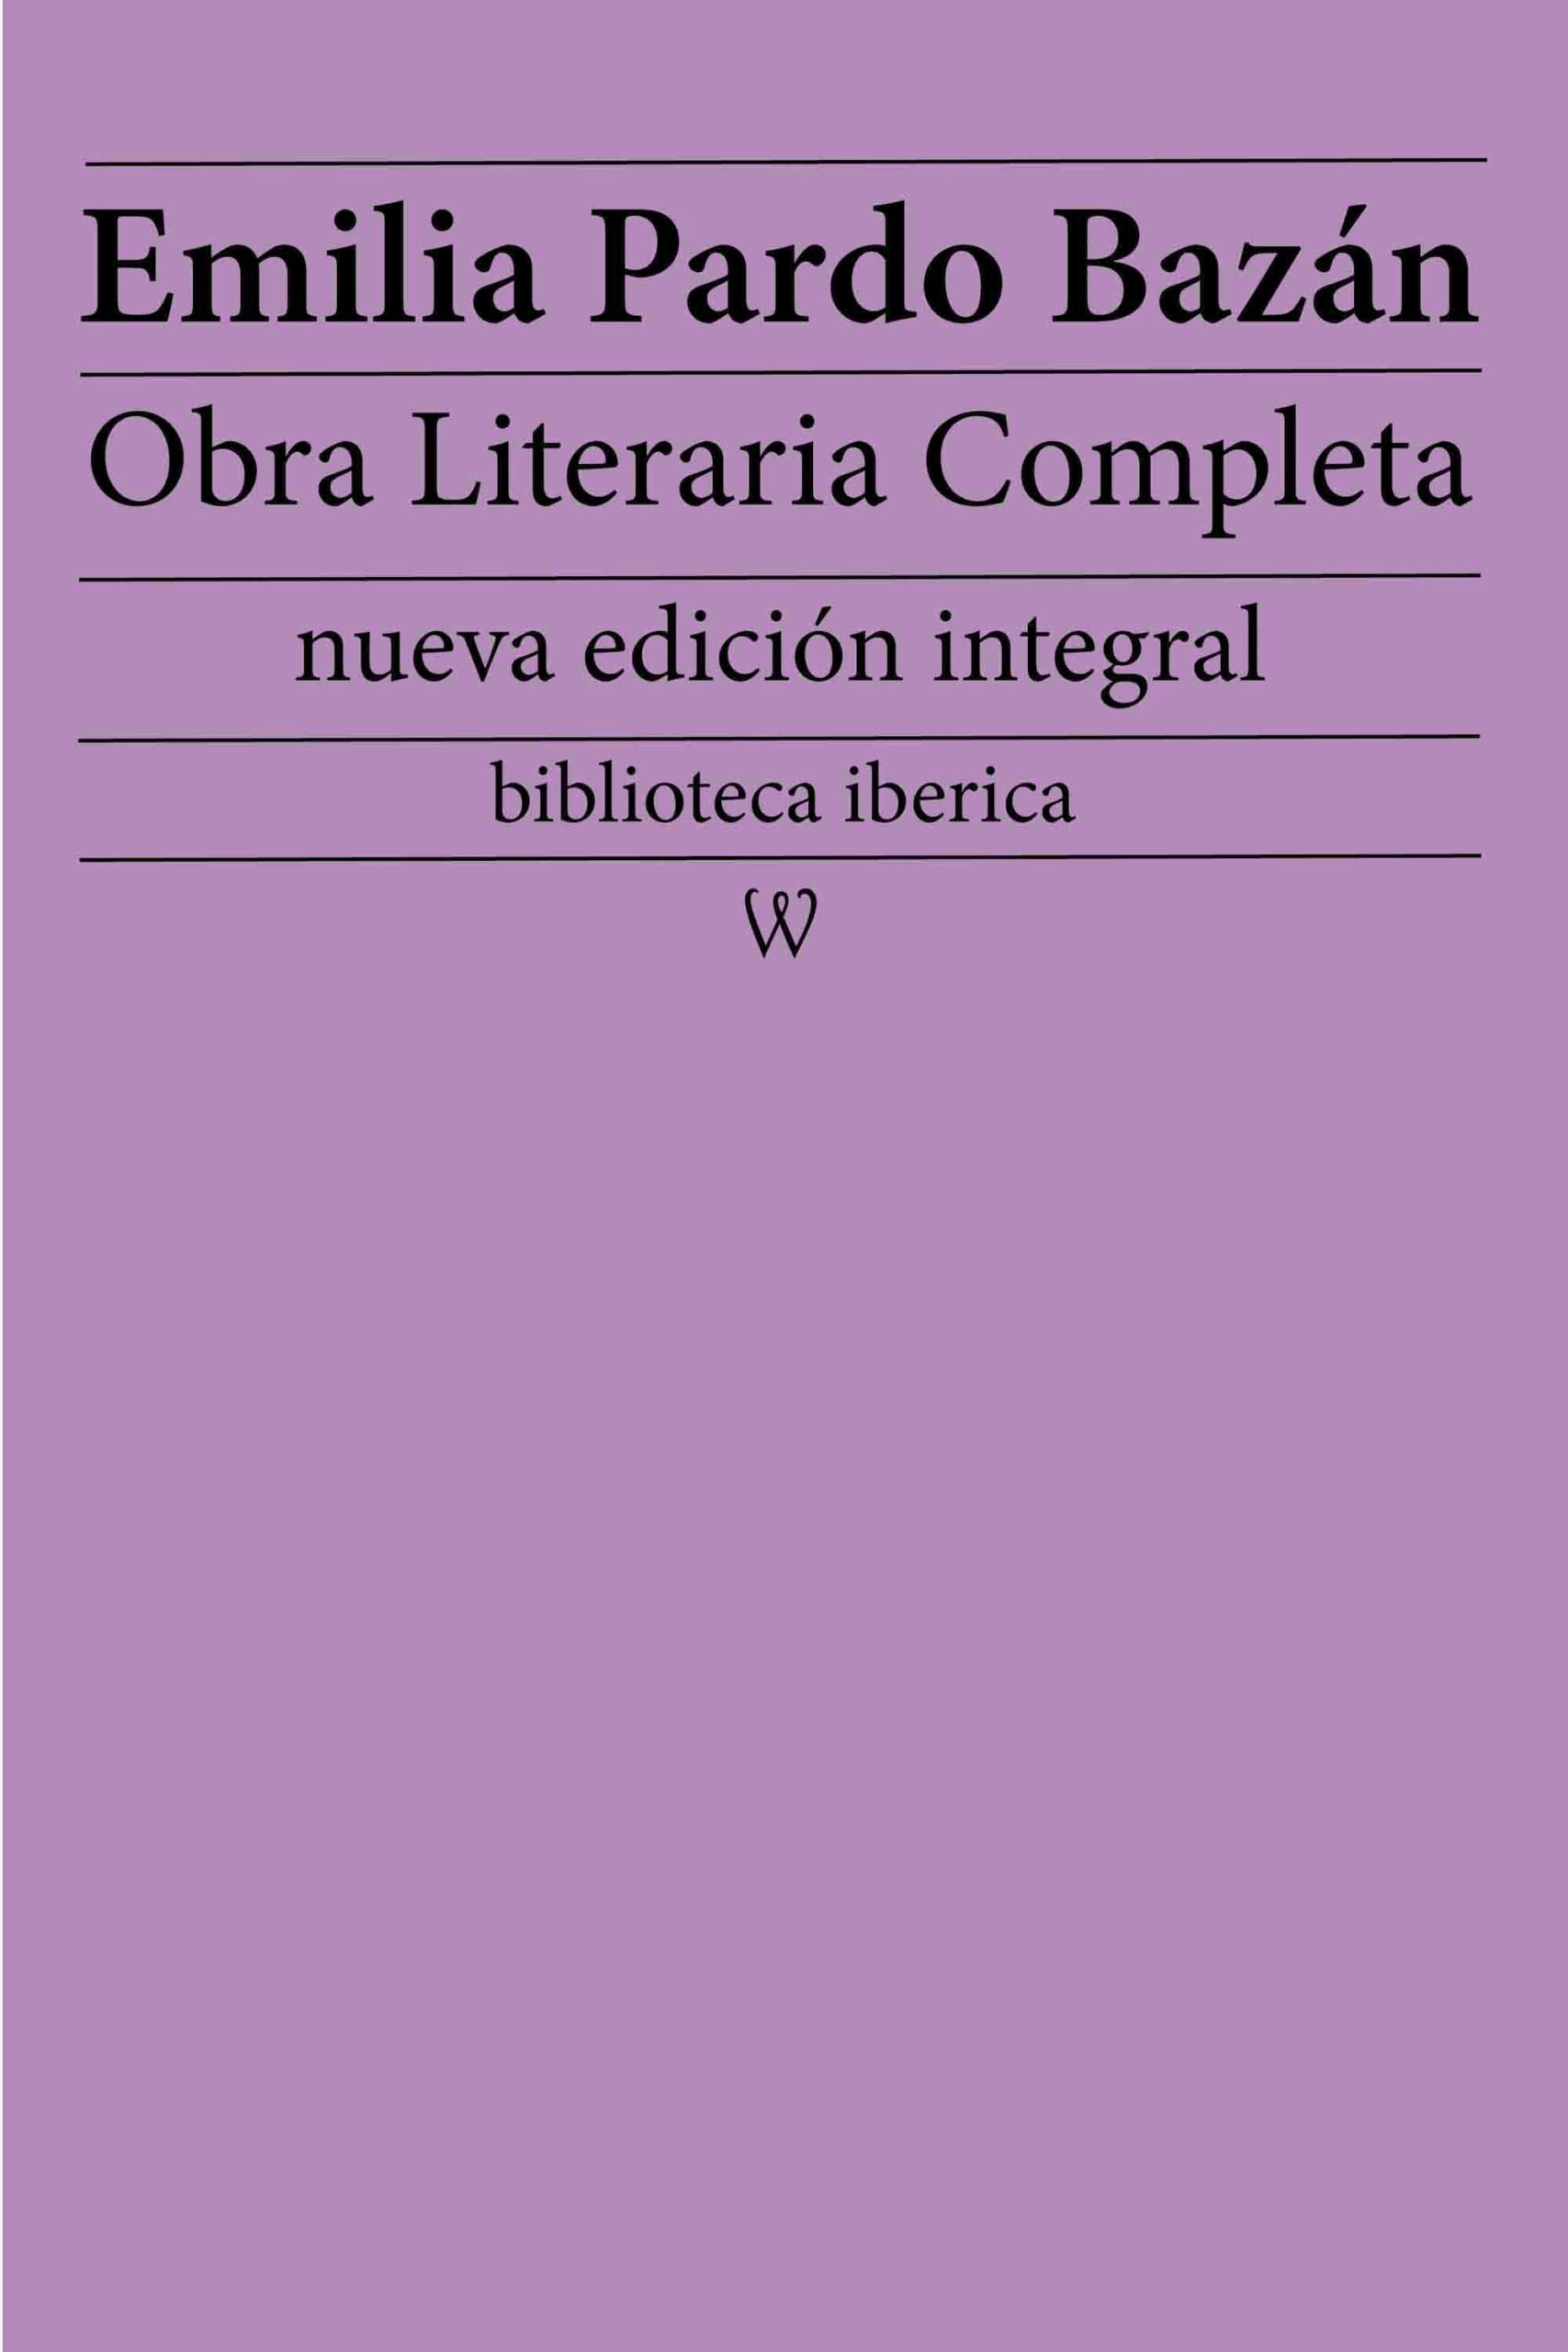 Emilia Pardo Bazán: Obra literaria completa